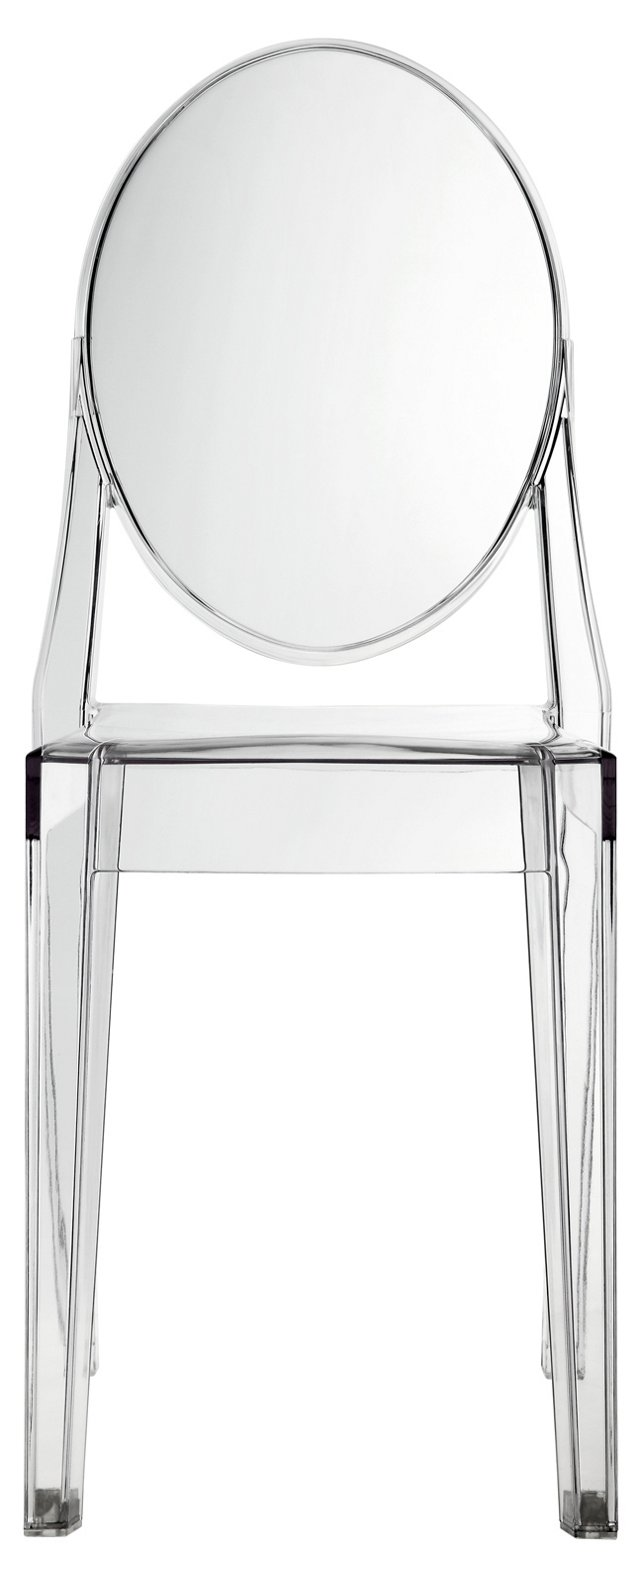 DNU, IK-Bilbao Side Chair, Clear